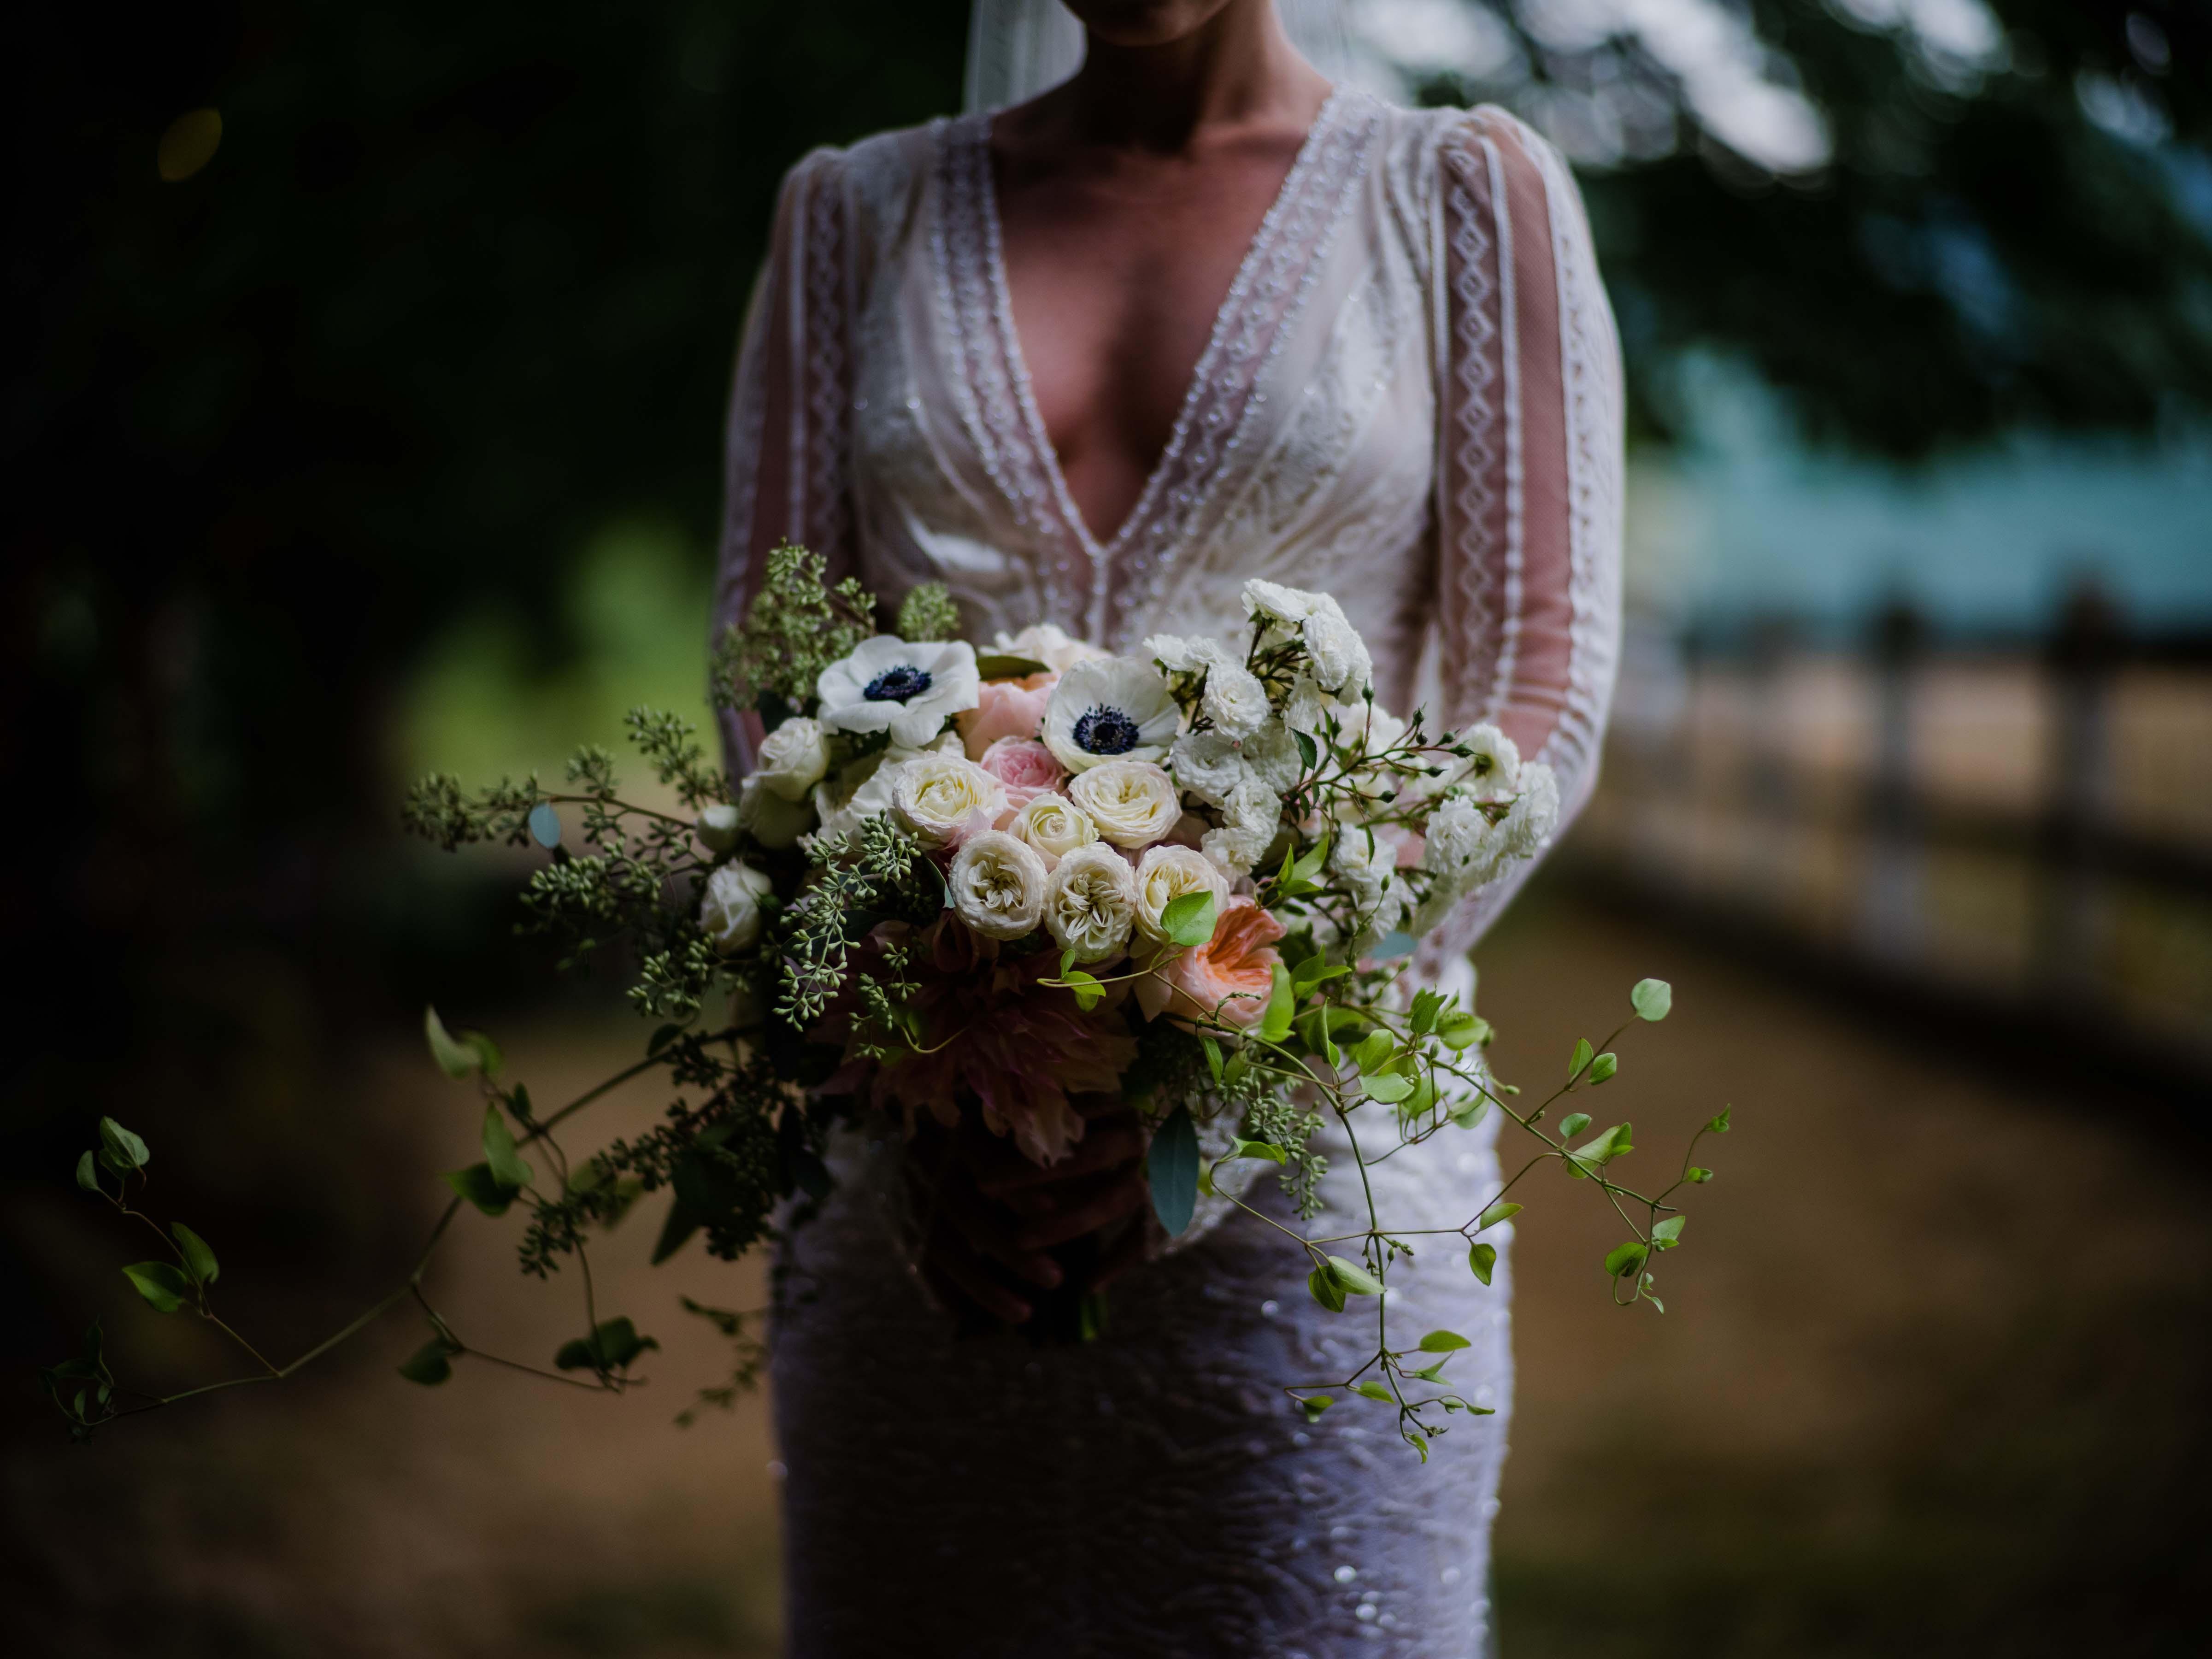 Garden bouquet of roses and anemones, designed by Flora Nova Design